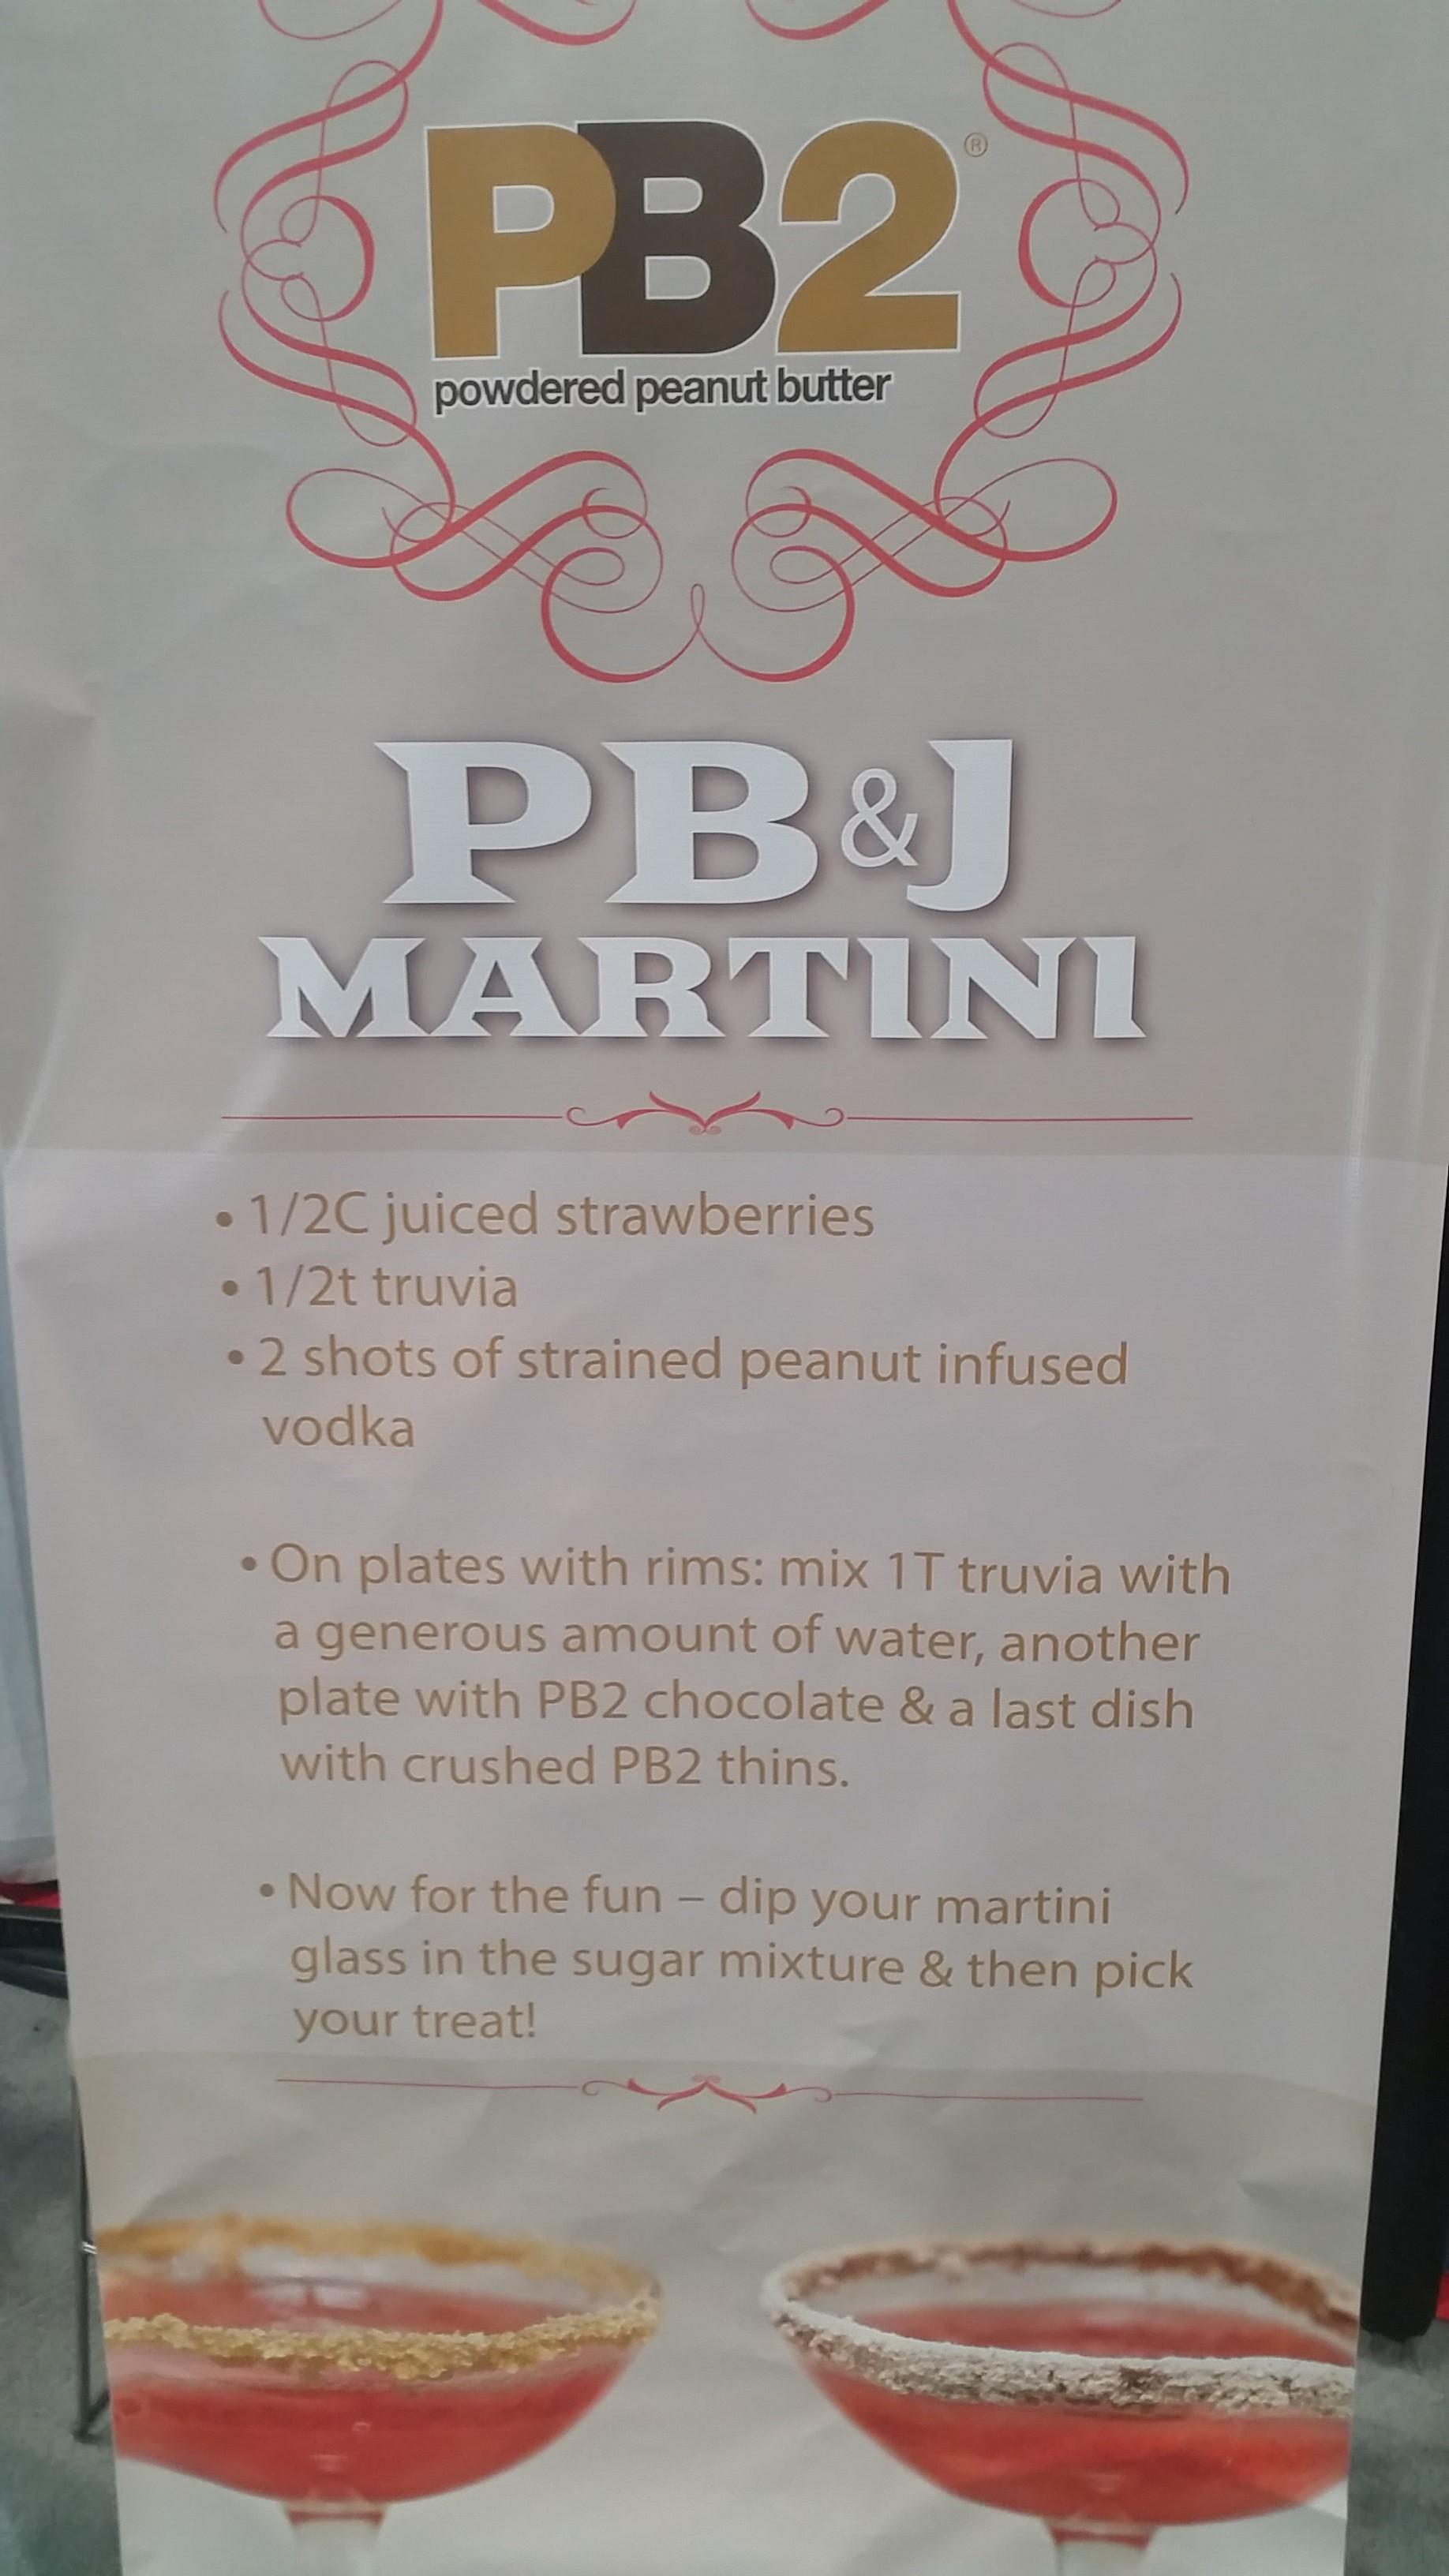 PB2 Powdered Peanut Butter - NCB Show 2016 Interesting Products - Bar-i Bar Inventory